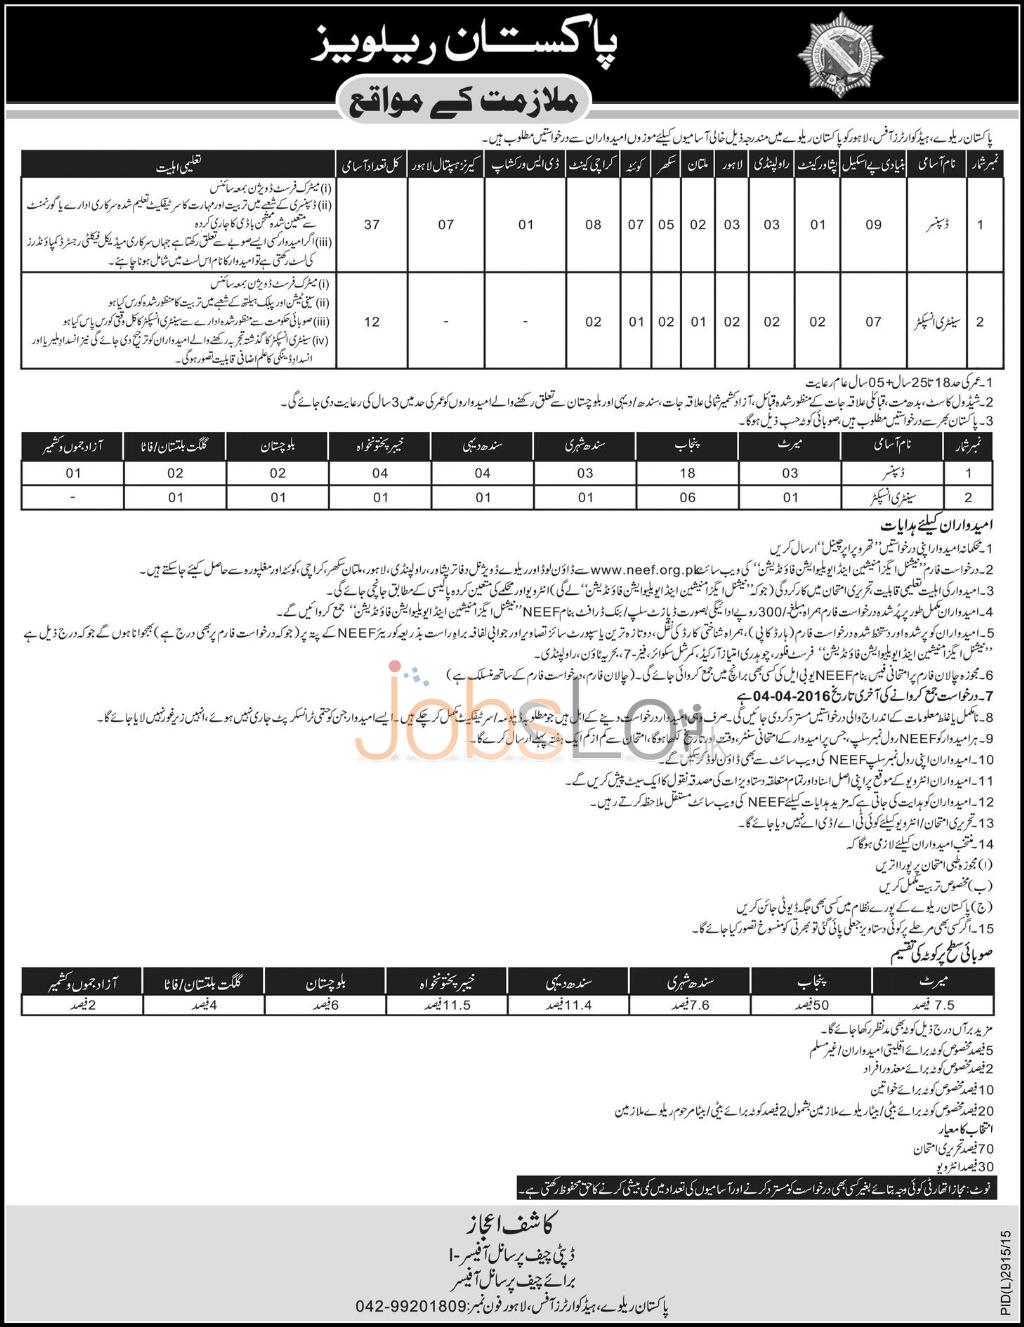 Pakistan Railways Headquartr Offic 2016 Lahore Application Form www.neef.org.pk